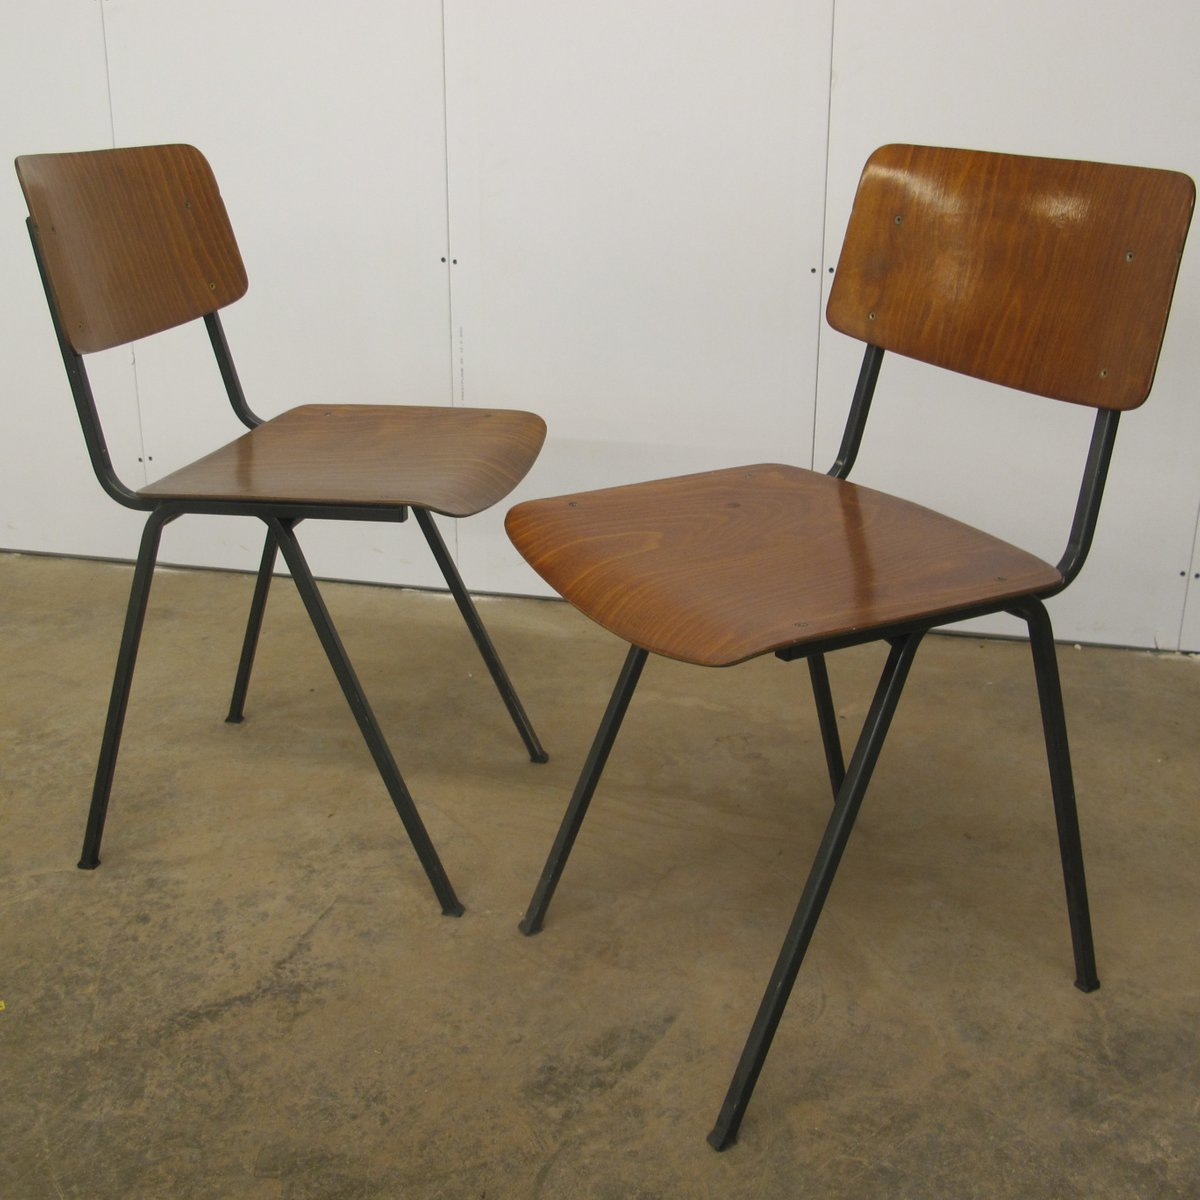 vintage st hle aus schichtholz stahl von marko 1960er 4er set bei pamono kaufen. Black Bedroom Furniture Sets. Home Design Ideas